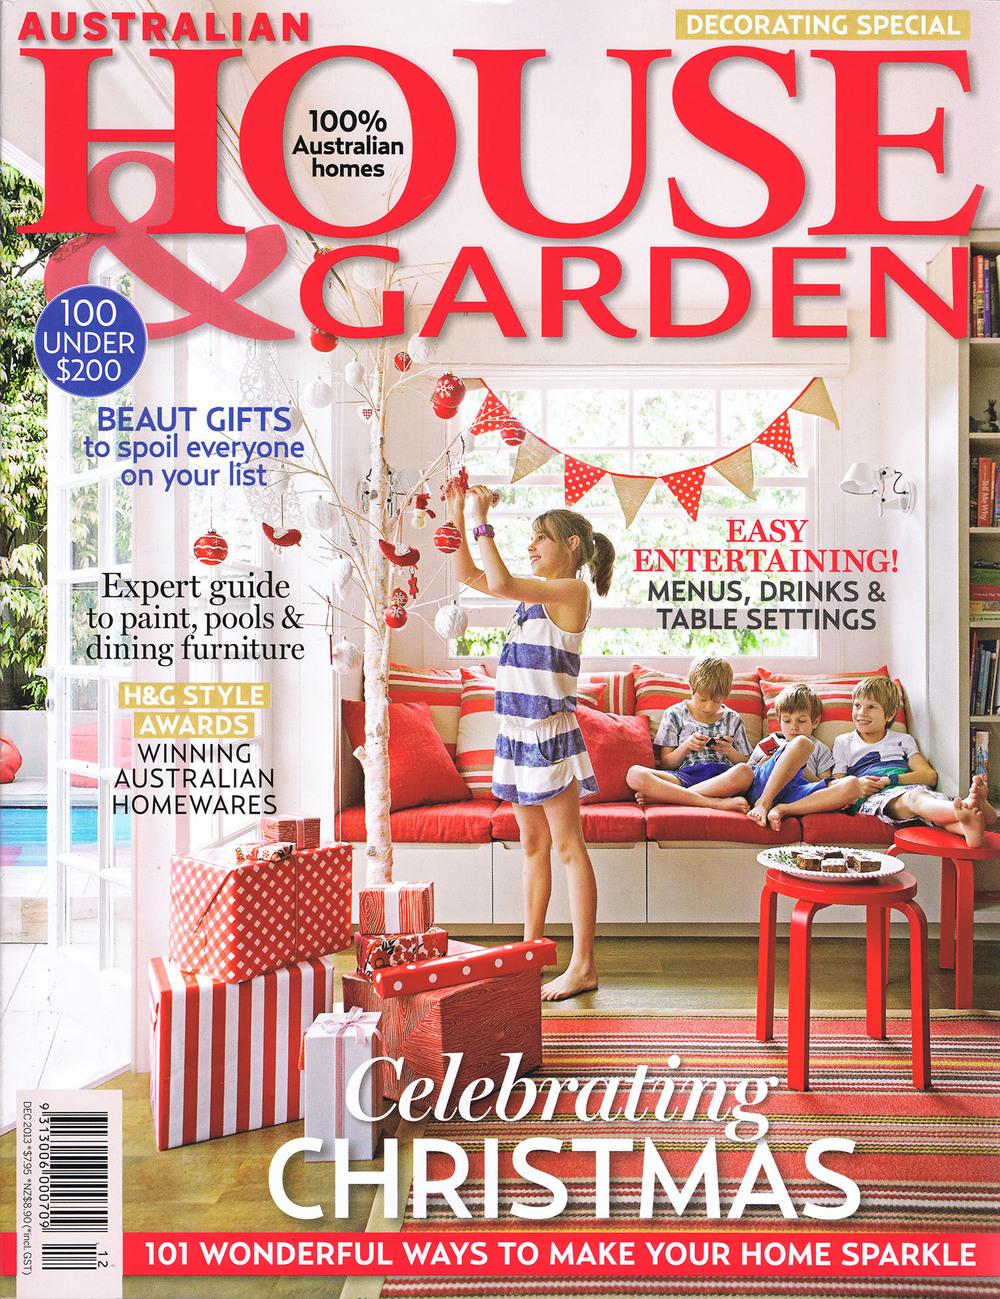 House & Garden December 2013